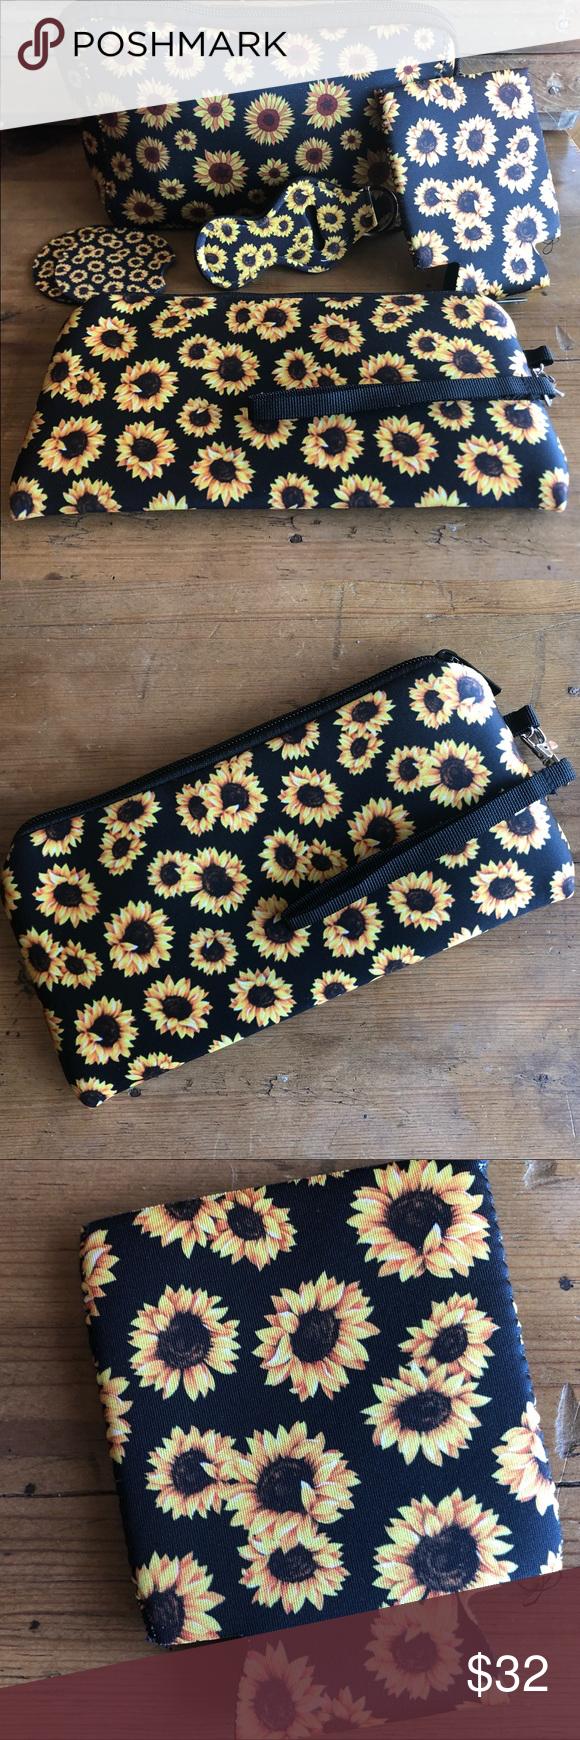 New 5 Piece Black Sunflower Set Sunflower, Things to